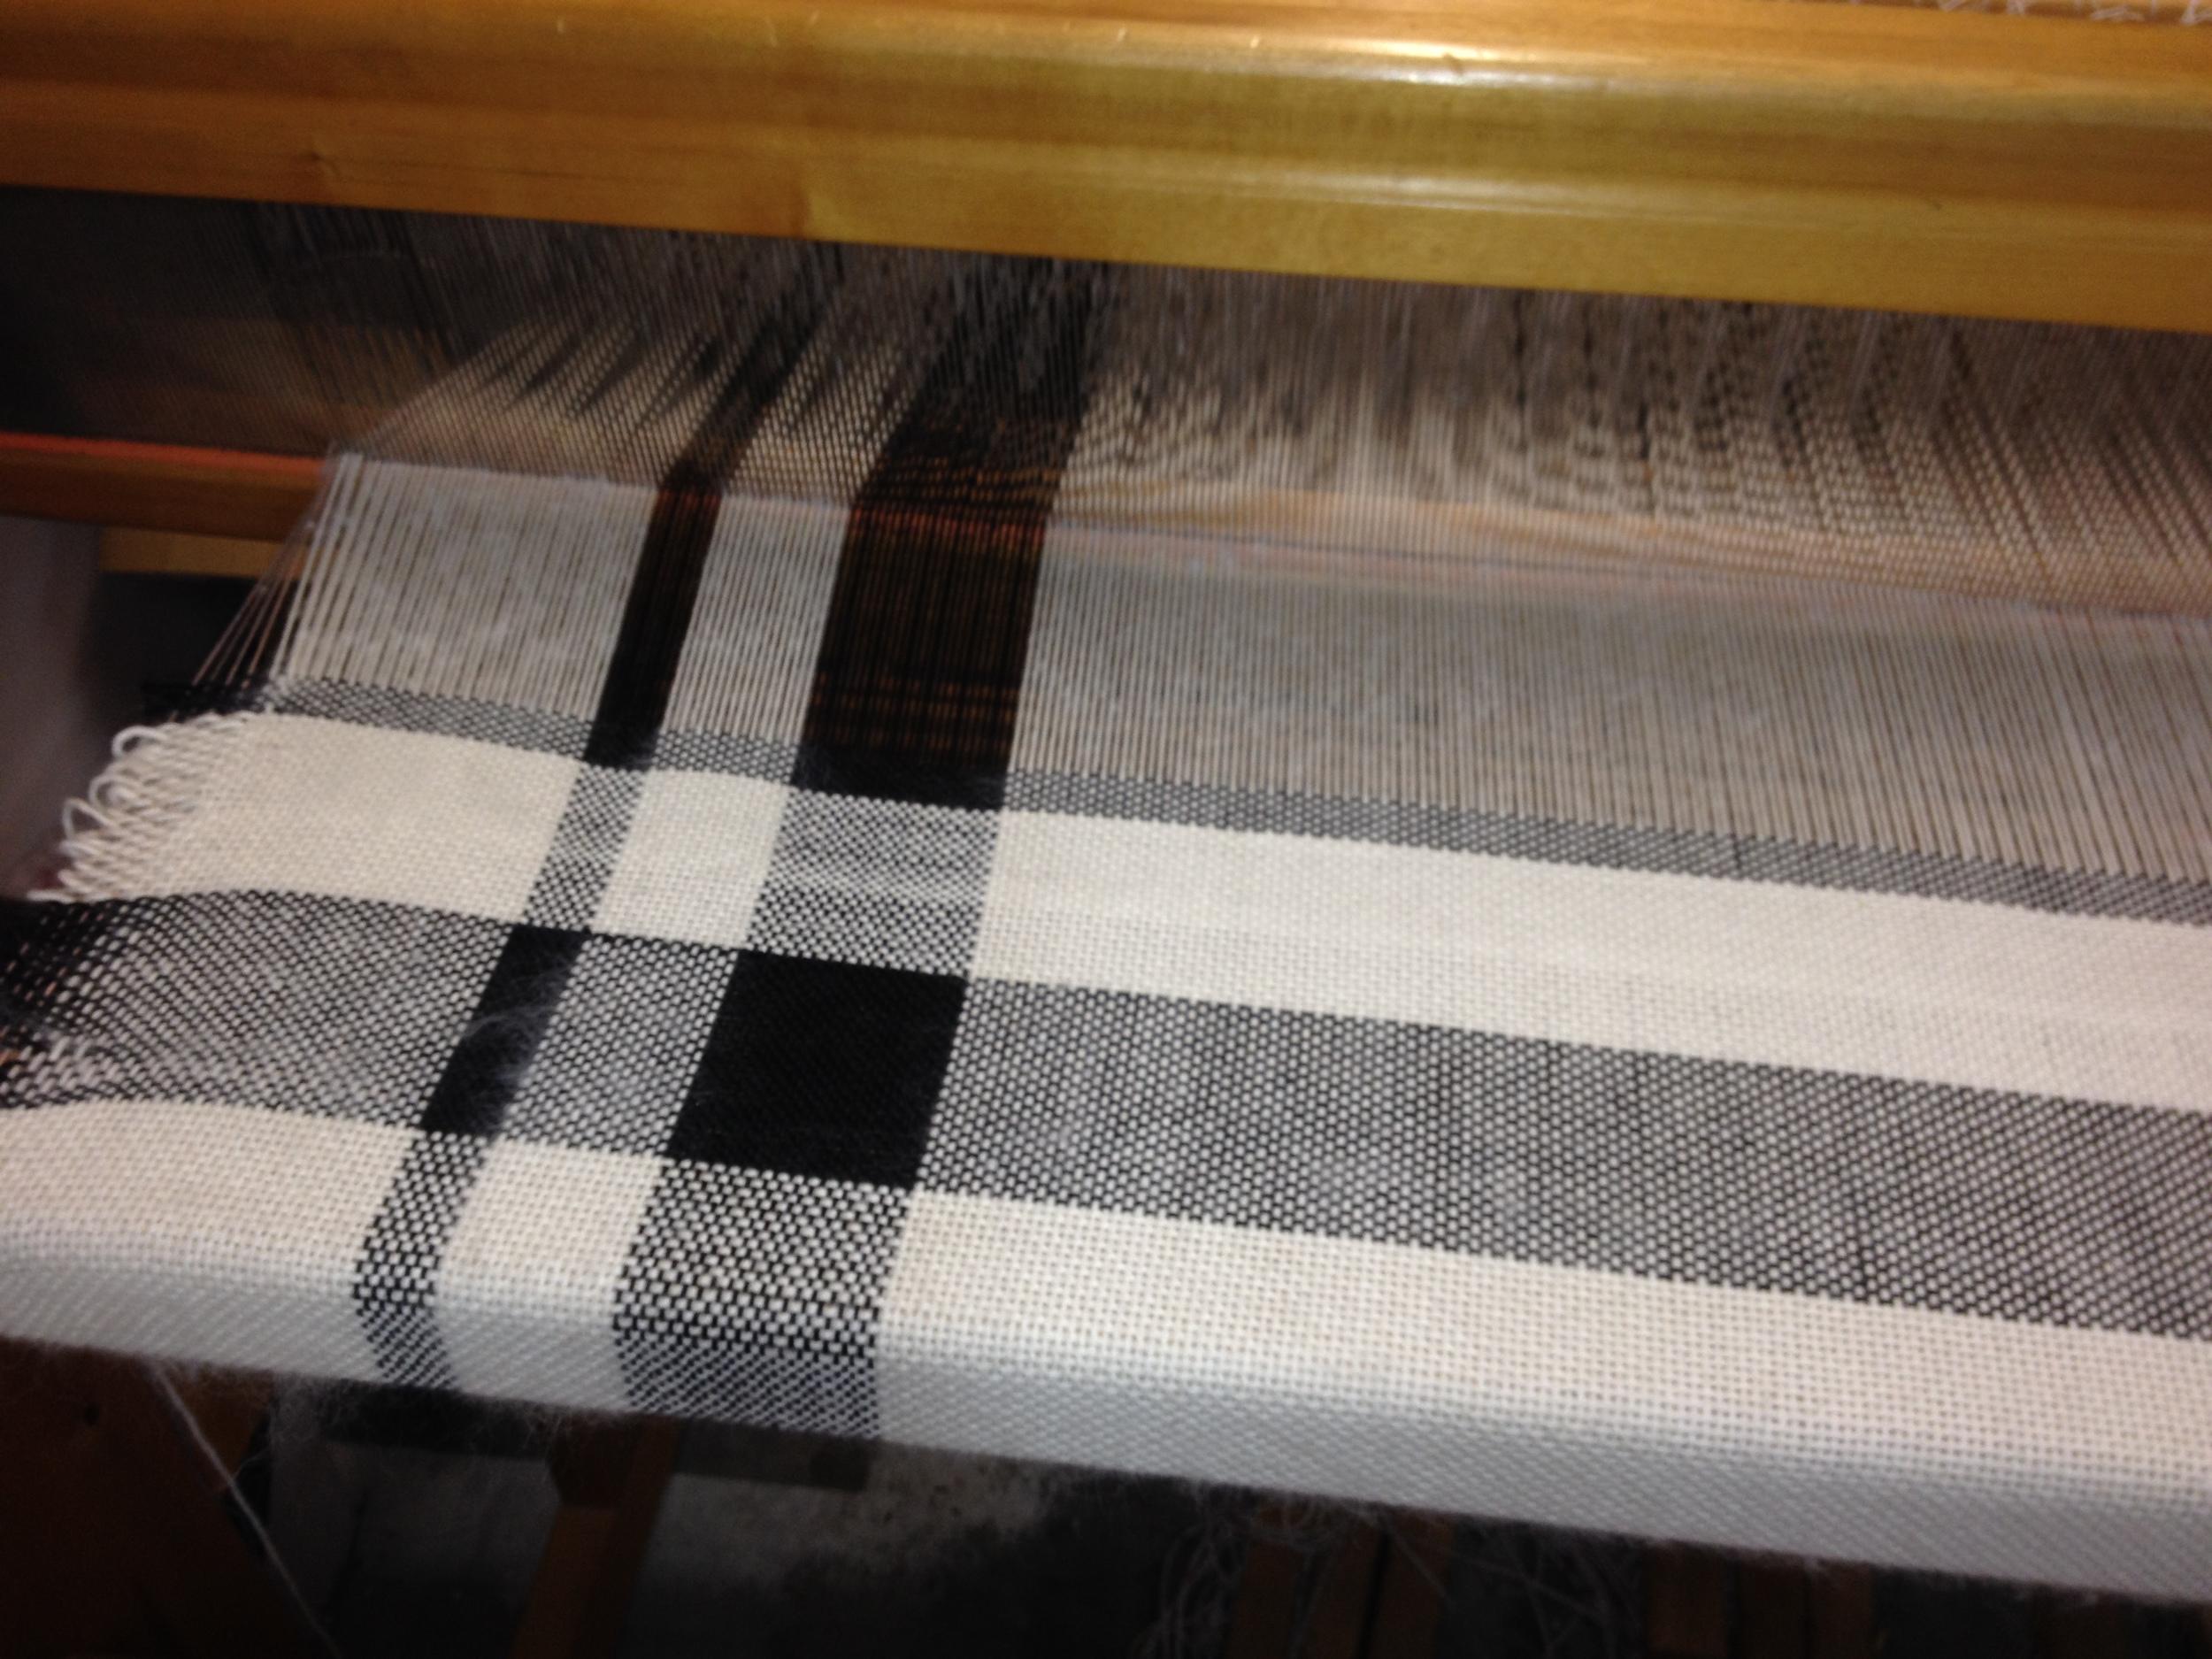 Minimalist Plaid in progress on the loom